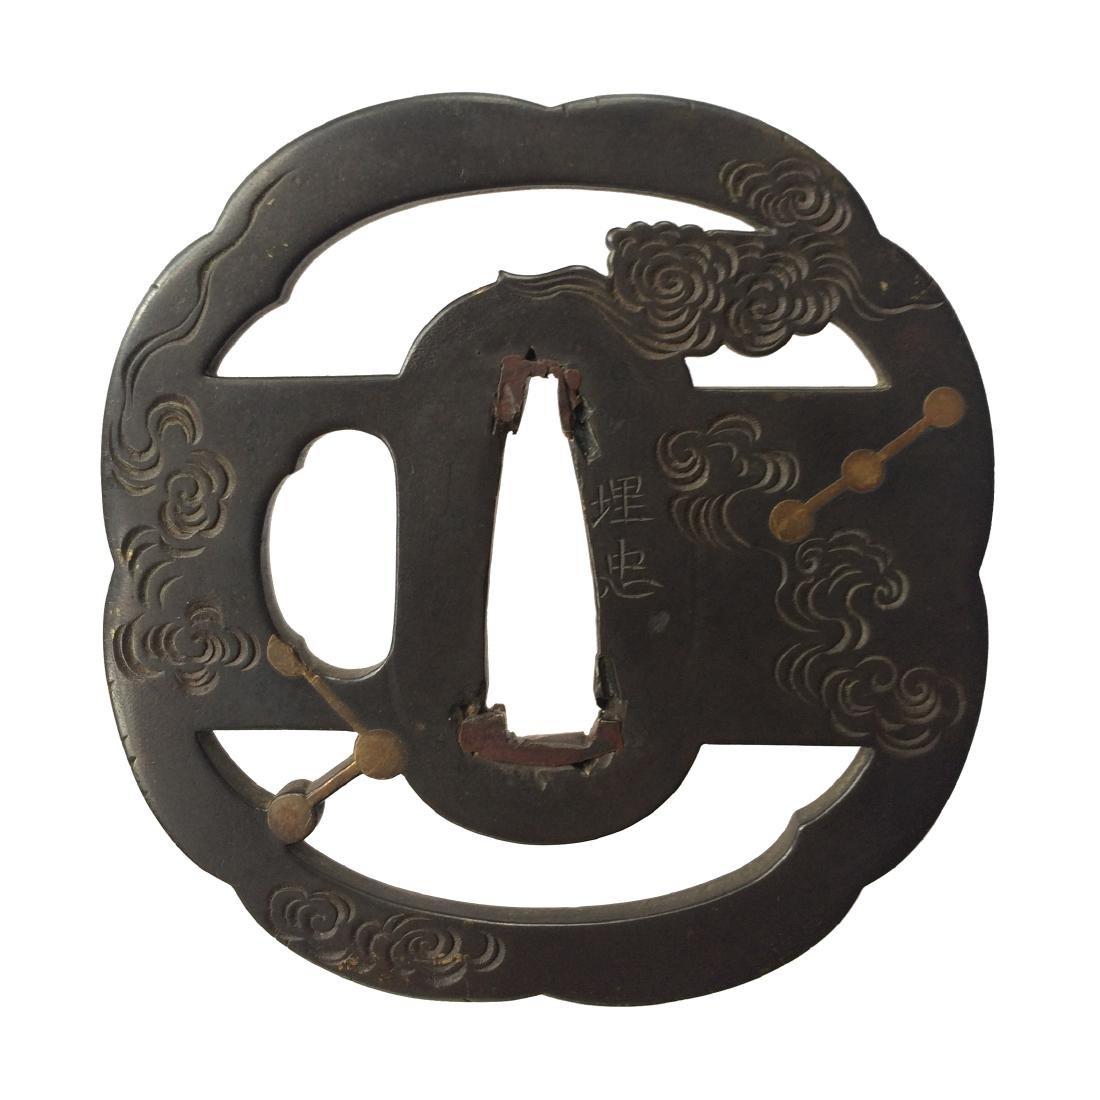 Signed kinko tsuba with celestial motif by Umetada - 4